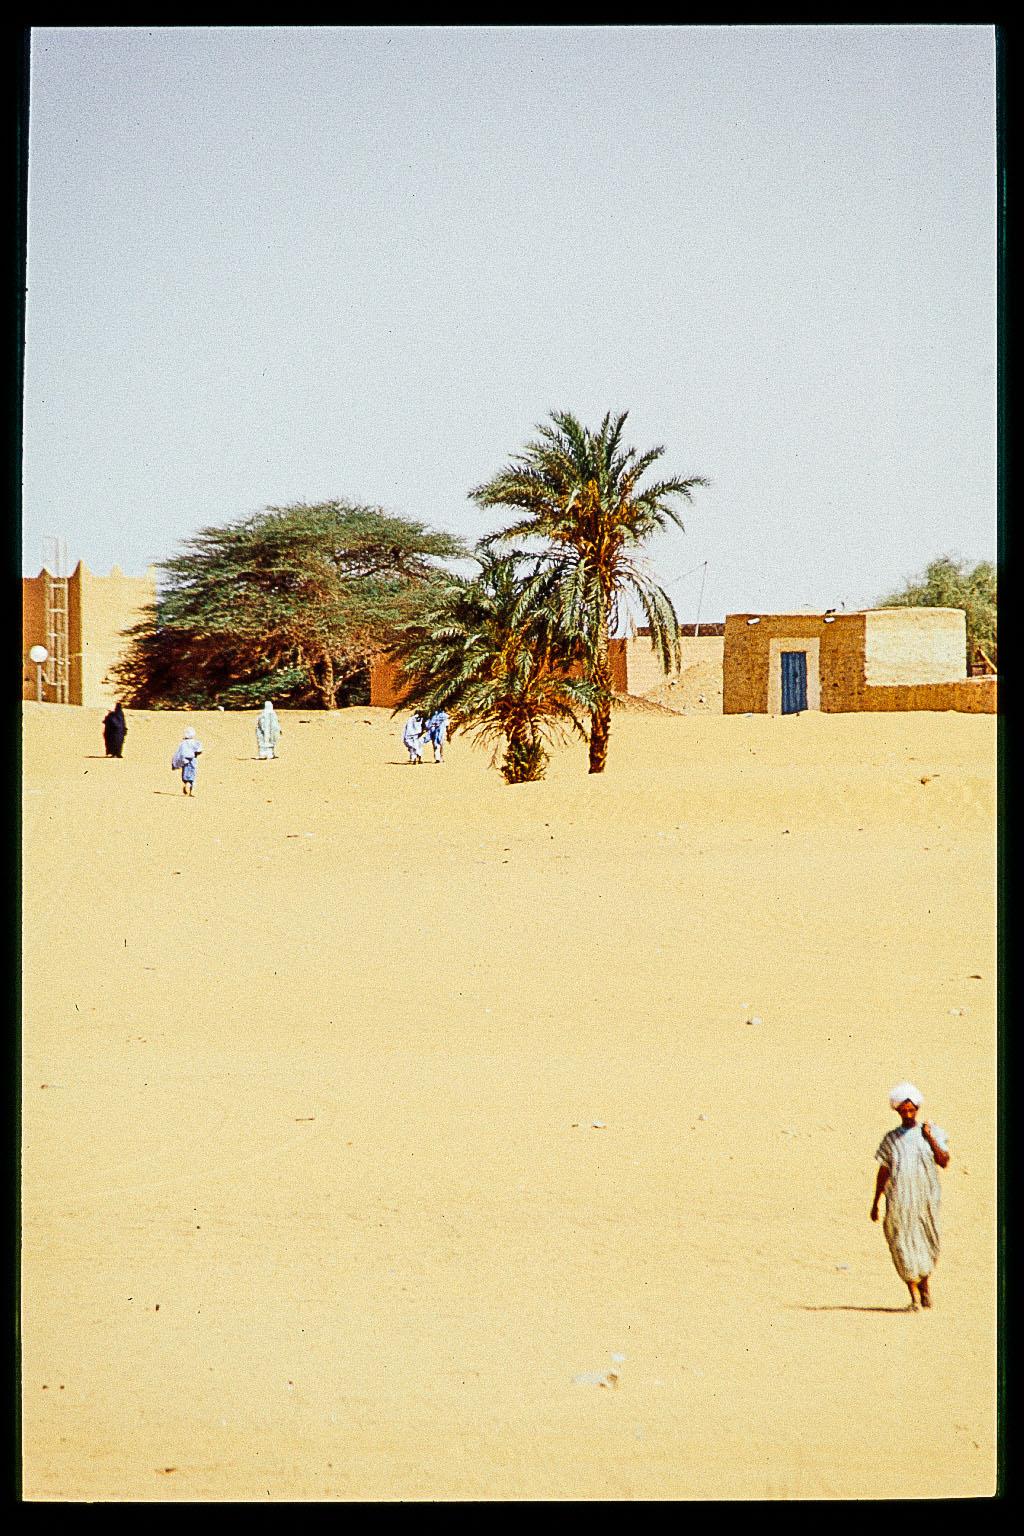 Chingetti, rêve de Mauritanie - Carnet de voyage en Mauritanie